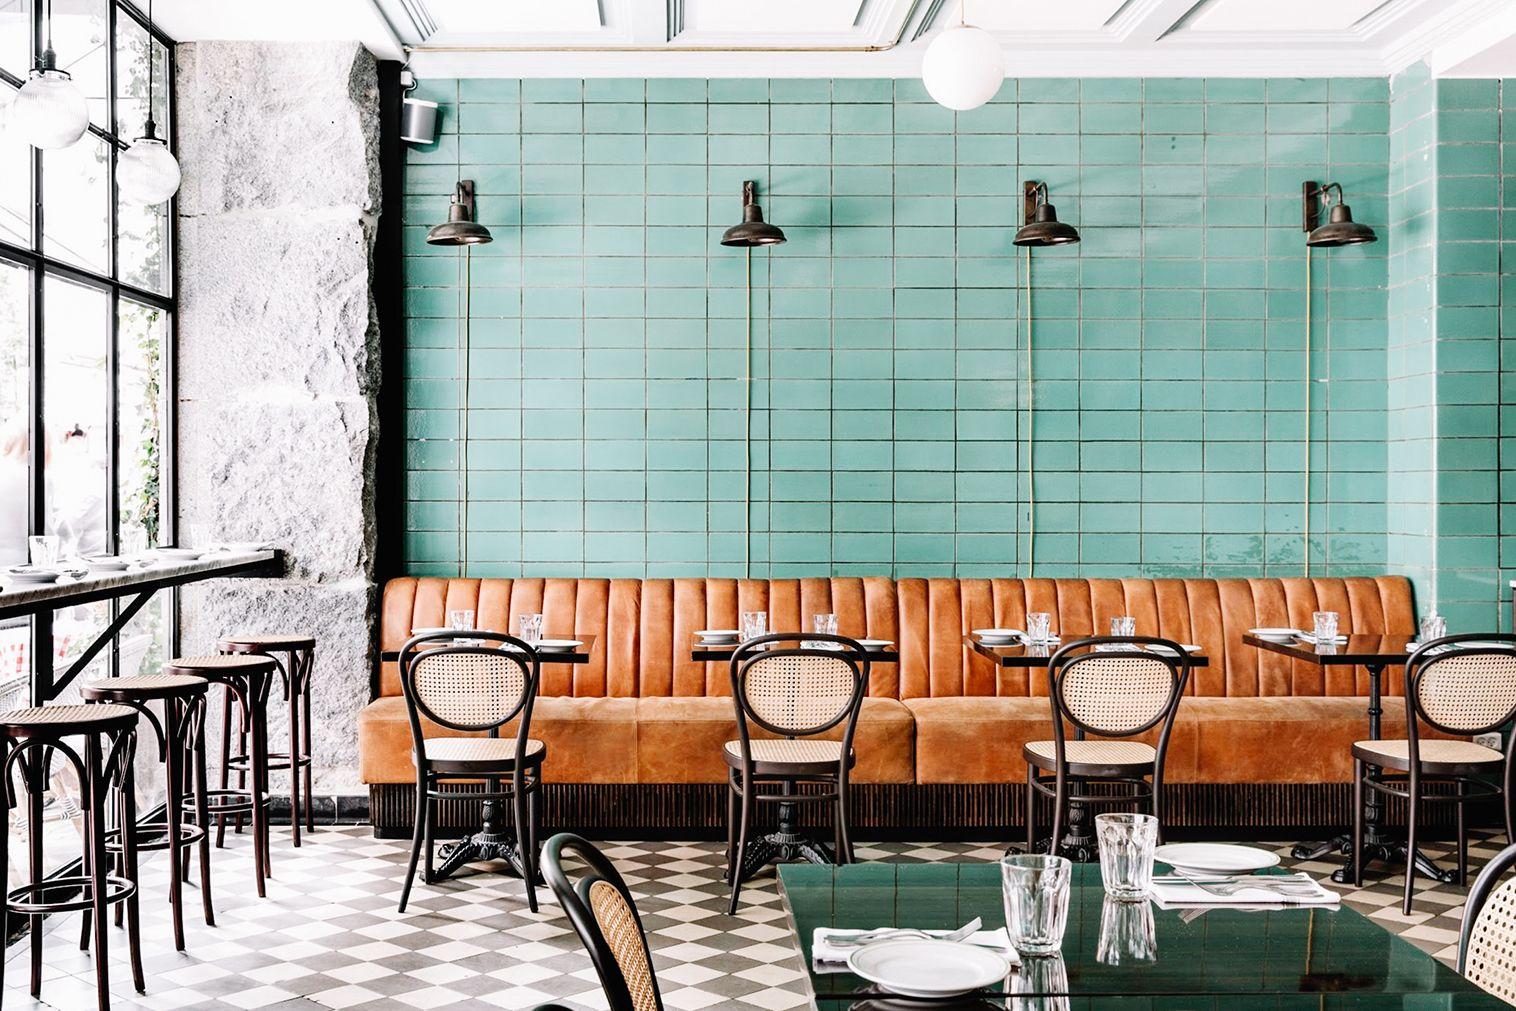 See How This Scandinavian Restaurant Does The Classic Parisian Bistro Desain Interior Interior Dan Desain